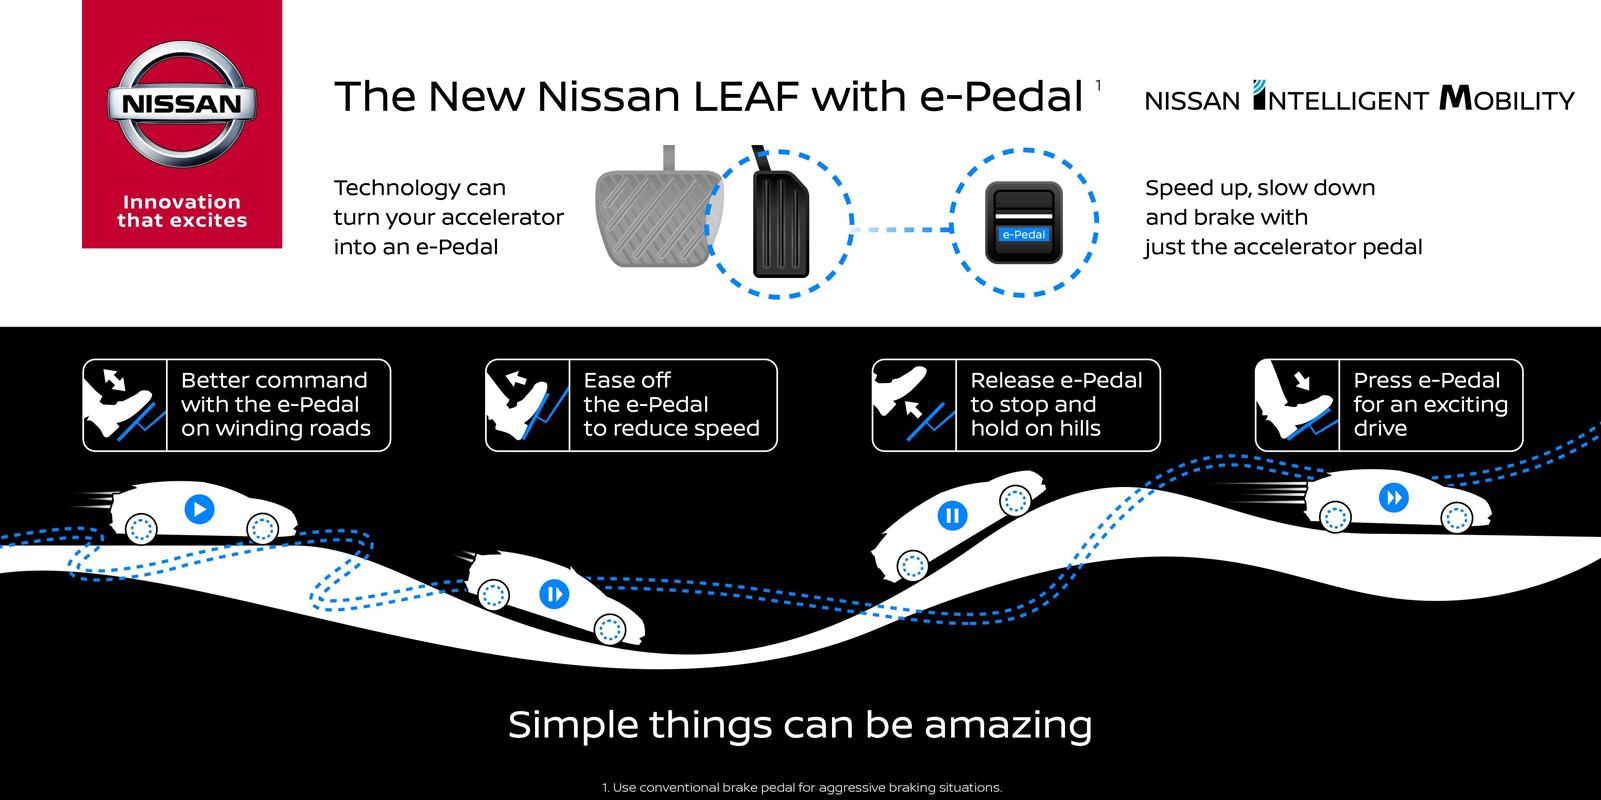 Nissan-LEAF-e-Pedal-2017